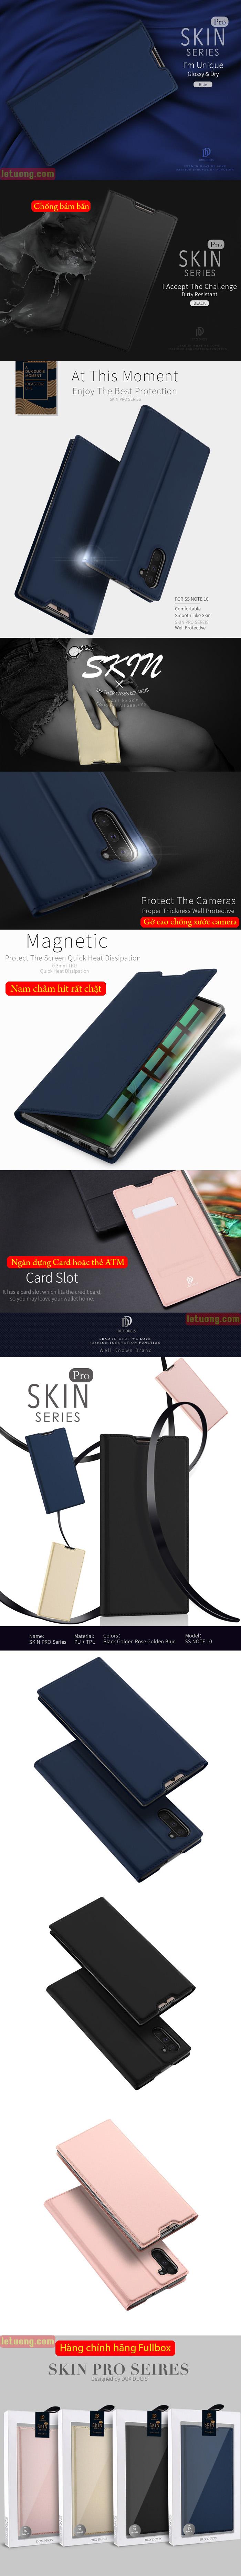 Bao da Galaxy Note 10 Dux Ducis Skin khung mềm - siêu mỏng - siêu mịn 5